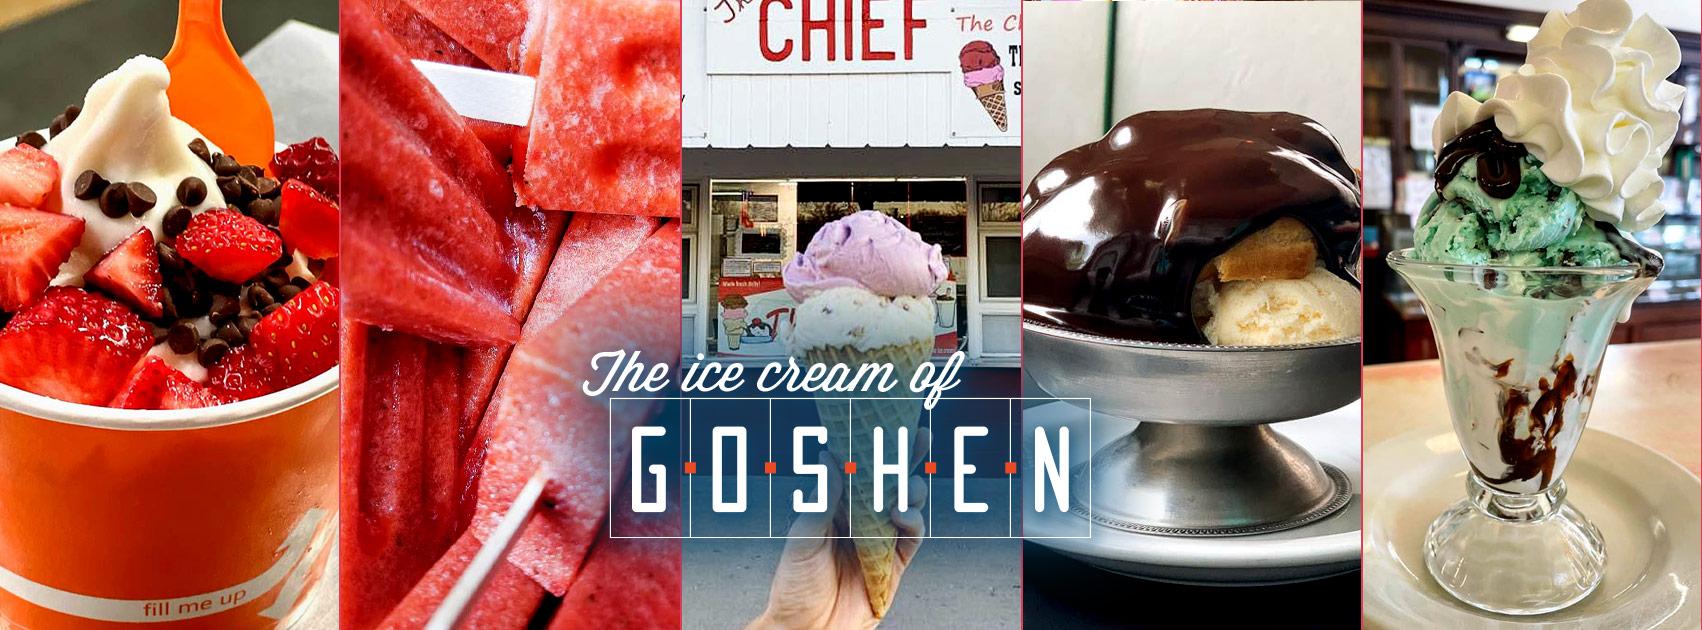 Only in Goshen Ice Cream • The Good of Goshen